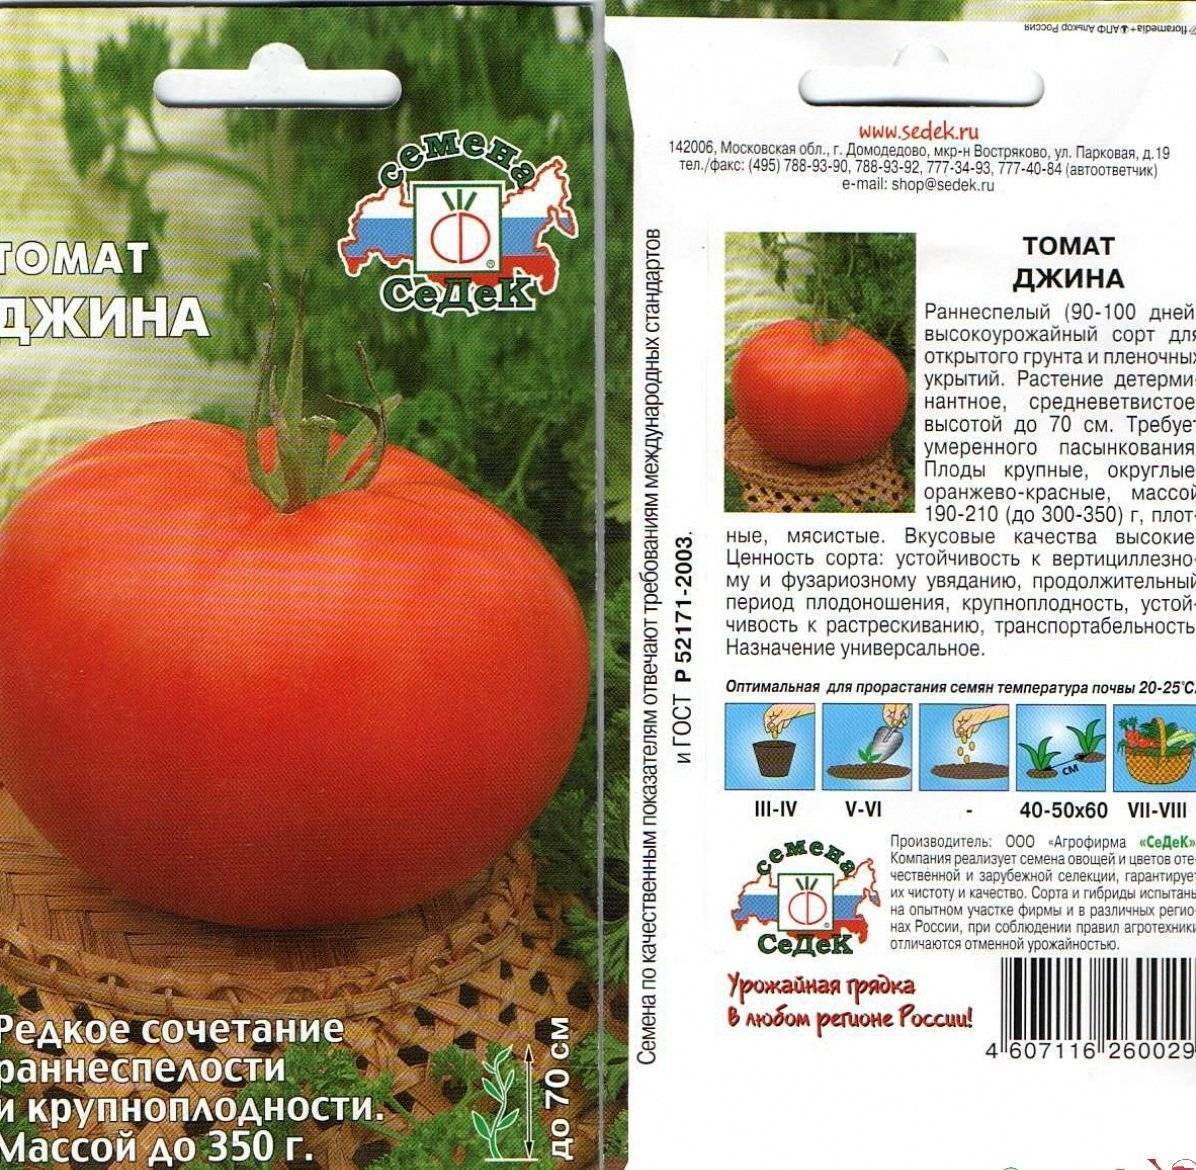 Сорт томата джина: отзывы, фото, описание сорта, характеристики